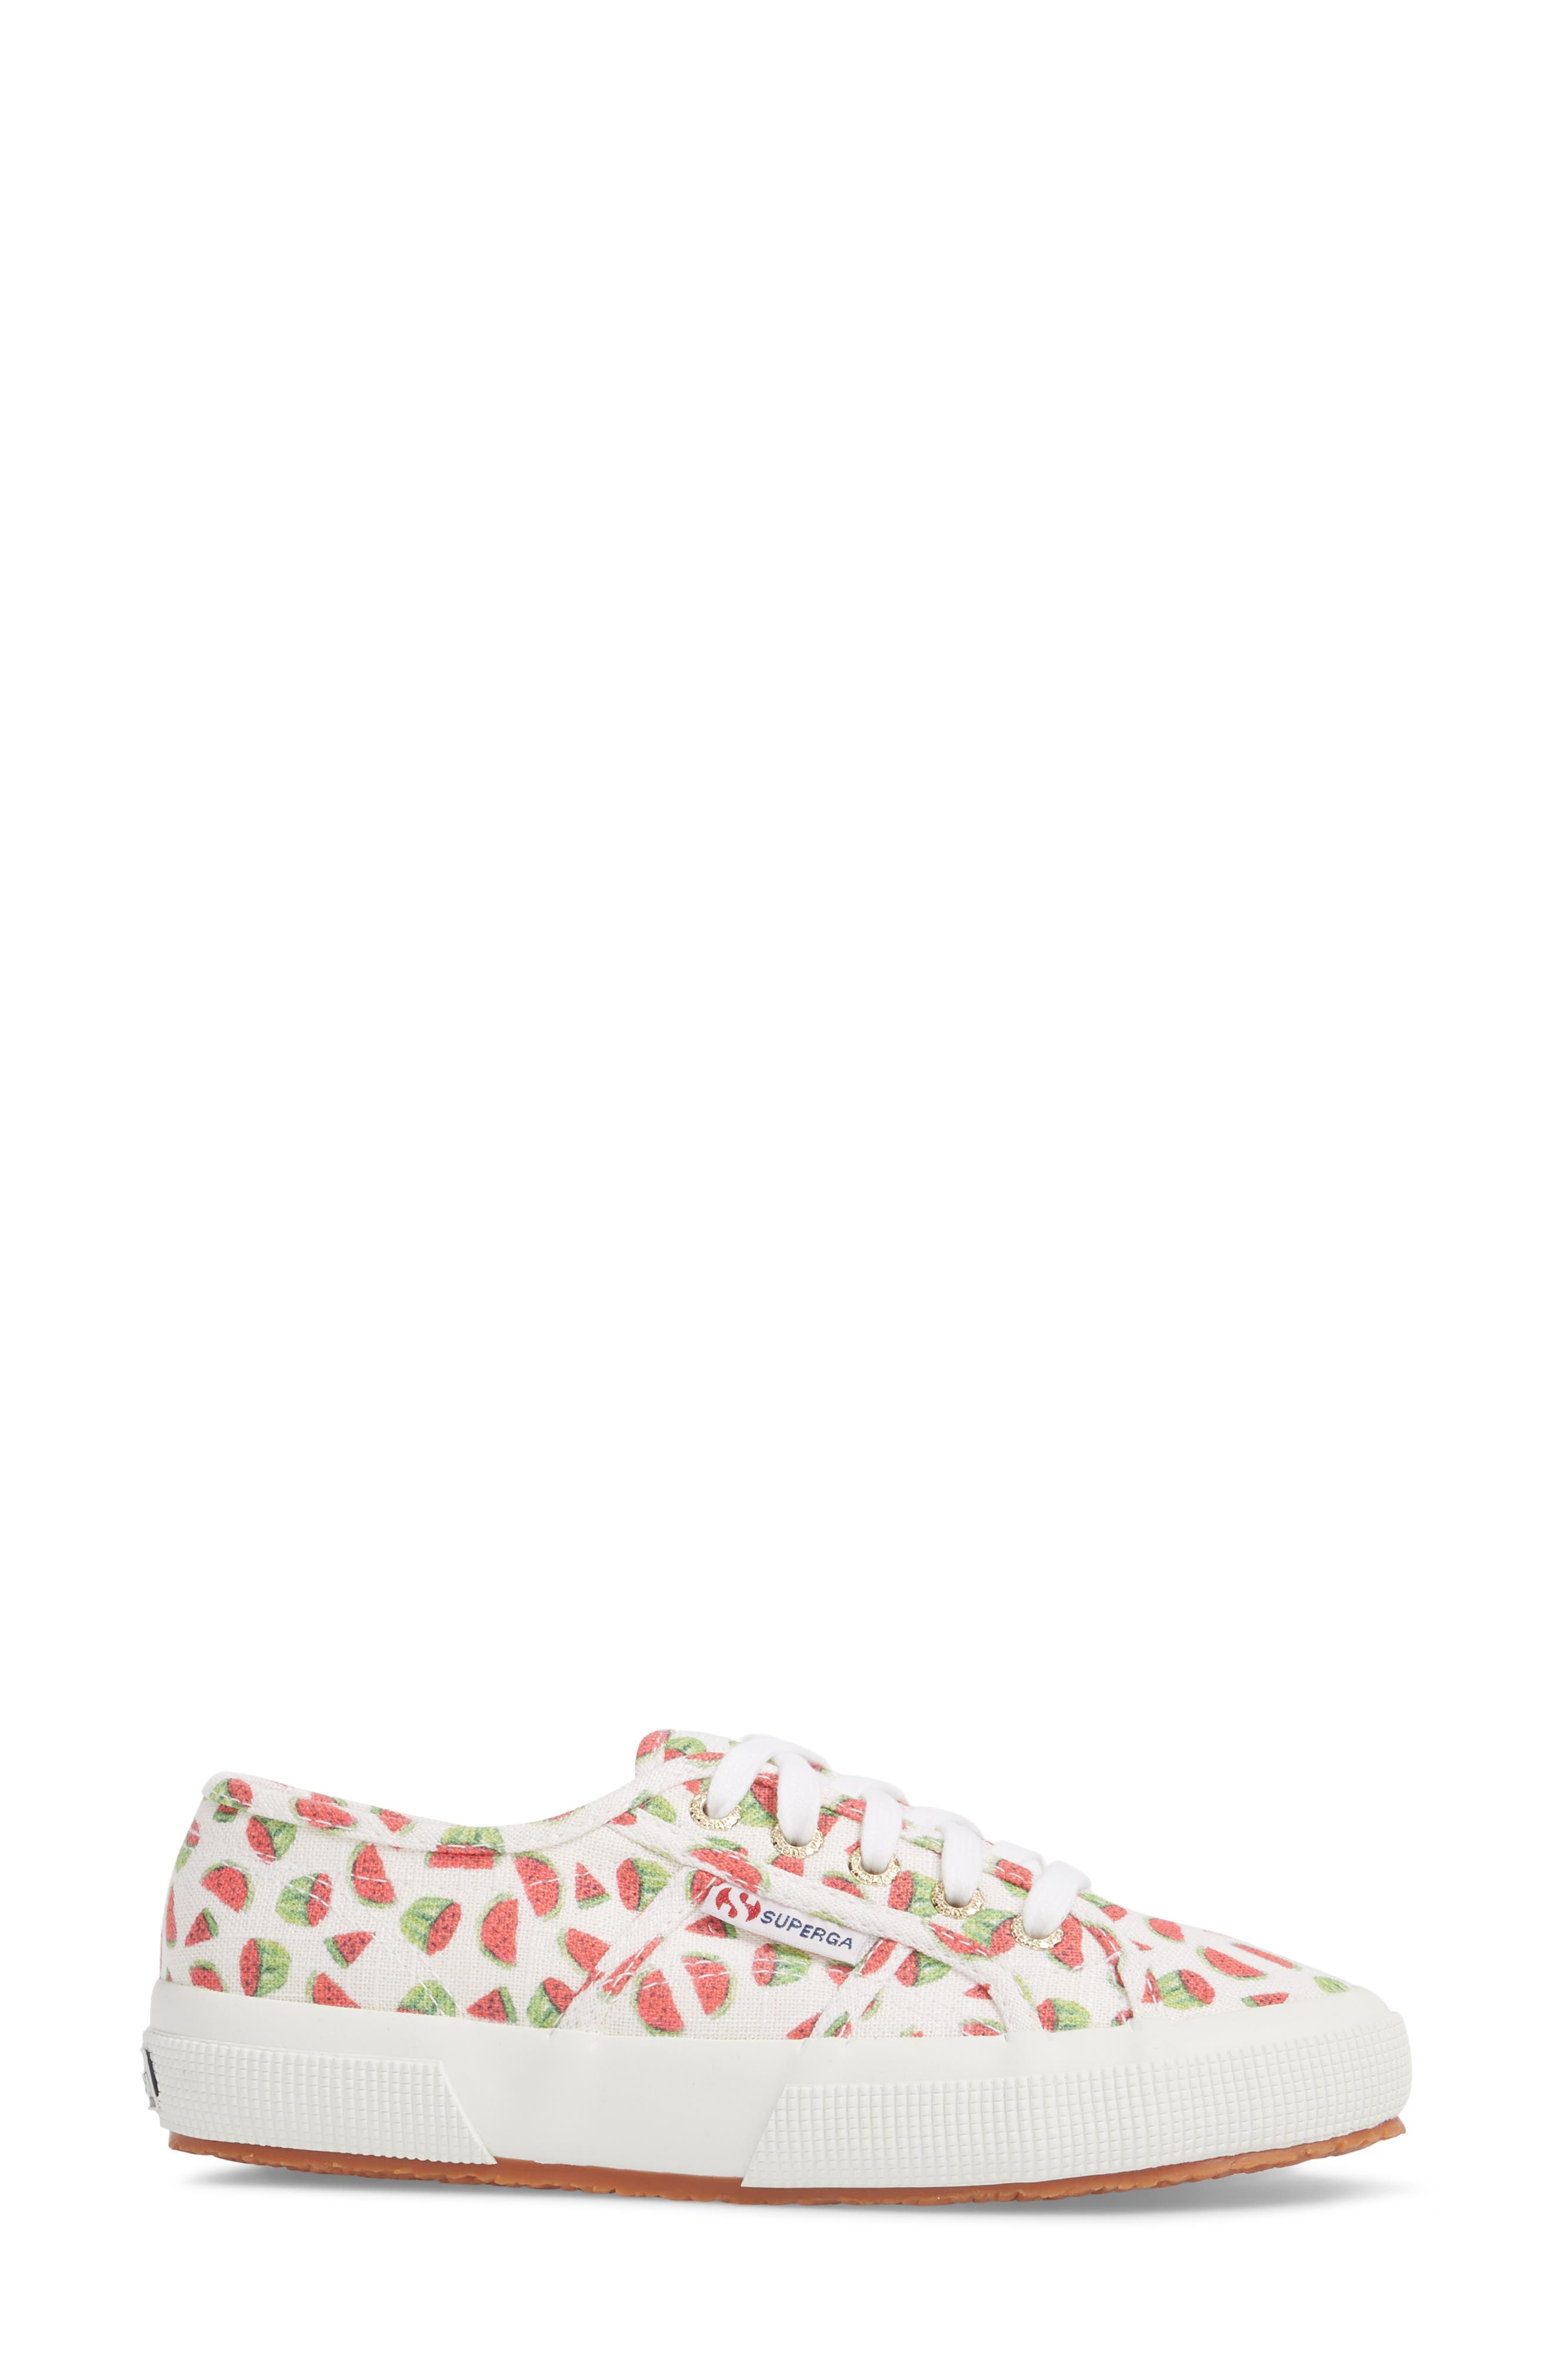 2750 Linenfruit Low Top Sneaker,                             Alternate thumbnail 3, color,                             600